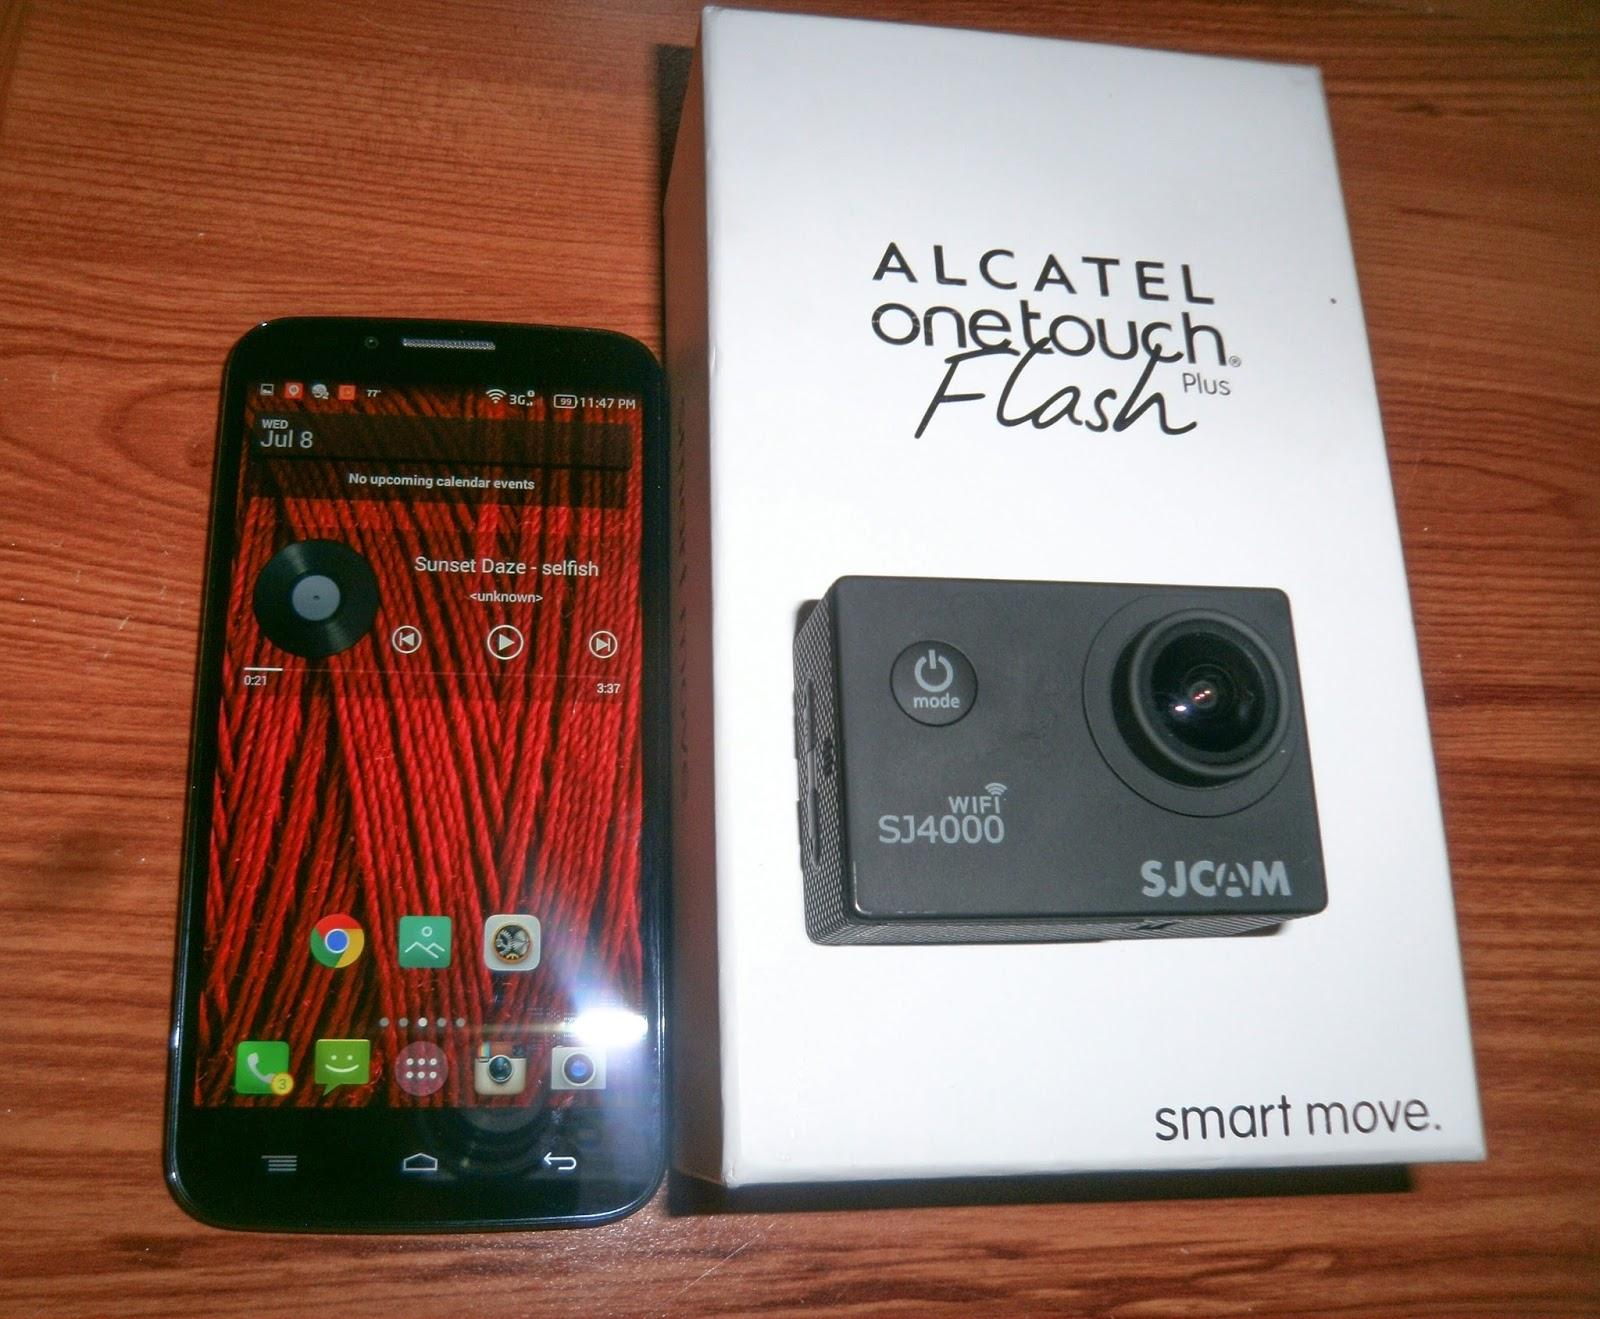 Karinazzytravels blogspot com: Alcatel Flash Plus Philippines